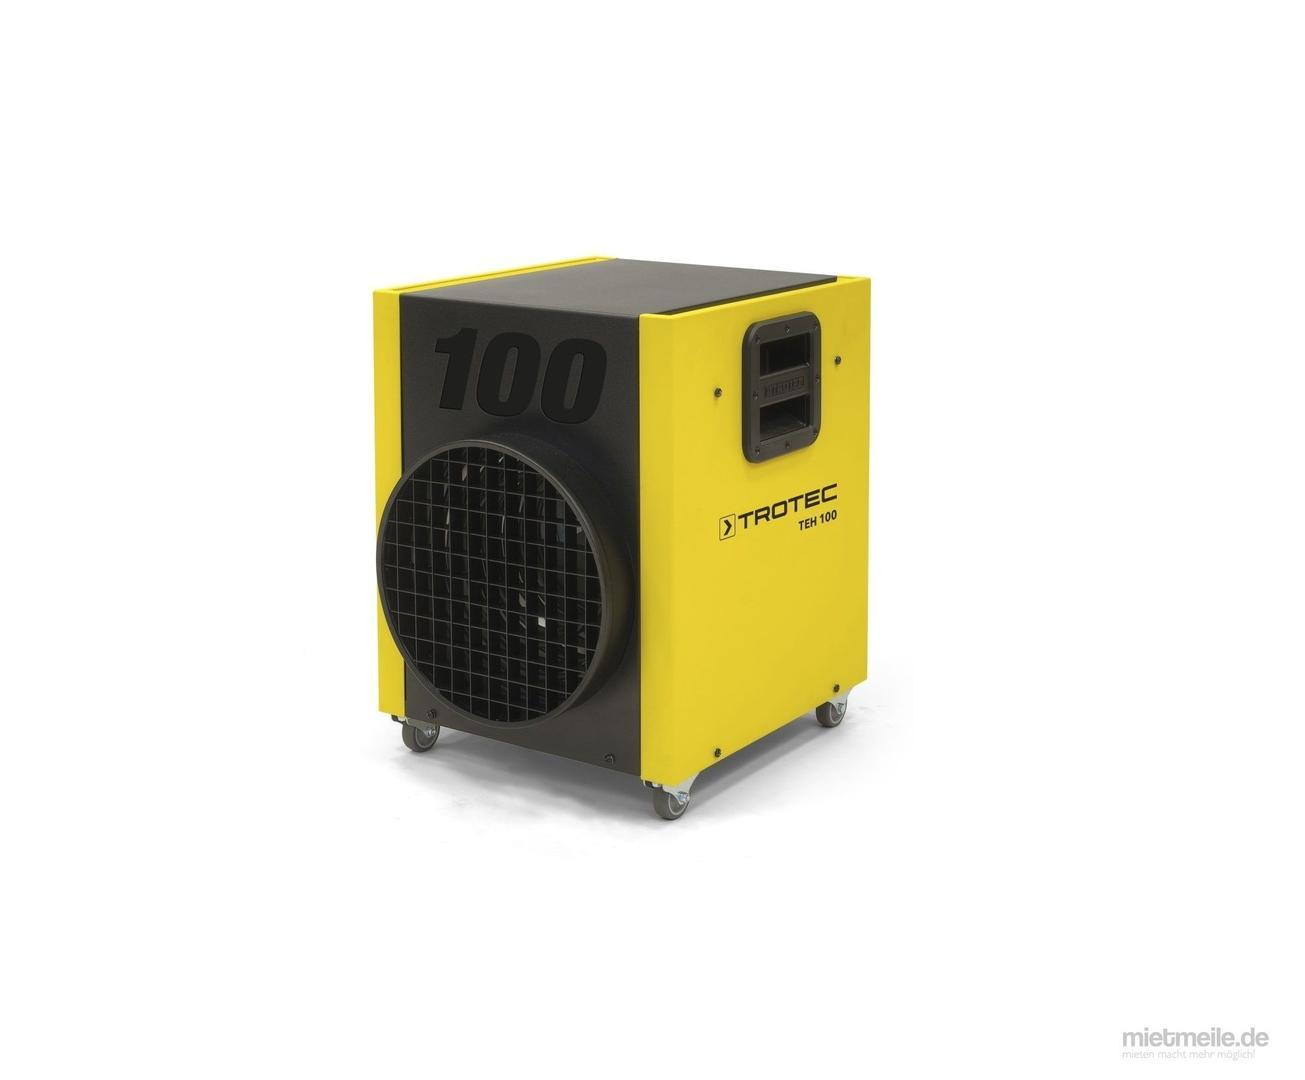 Nebelmaschine mieten & vermieten - Große Bodennebelmachine - Bodennebel inkl. Fluid in Wismar